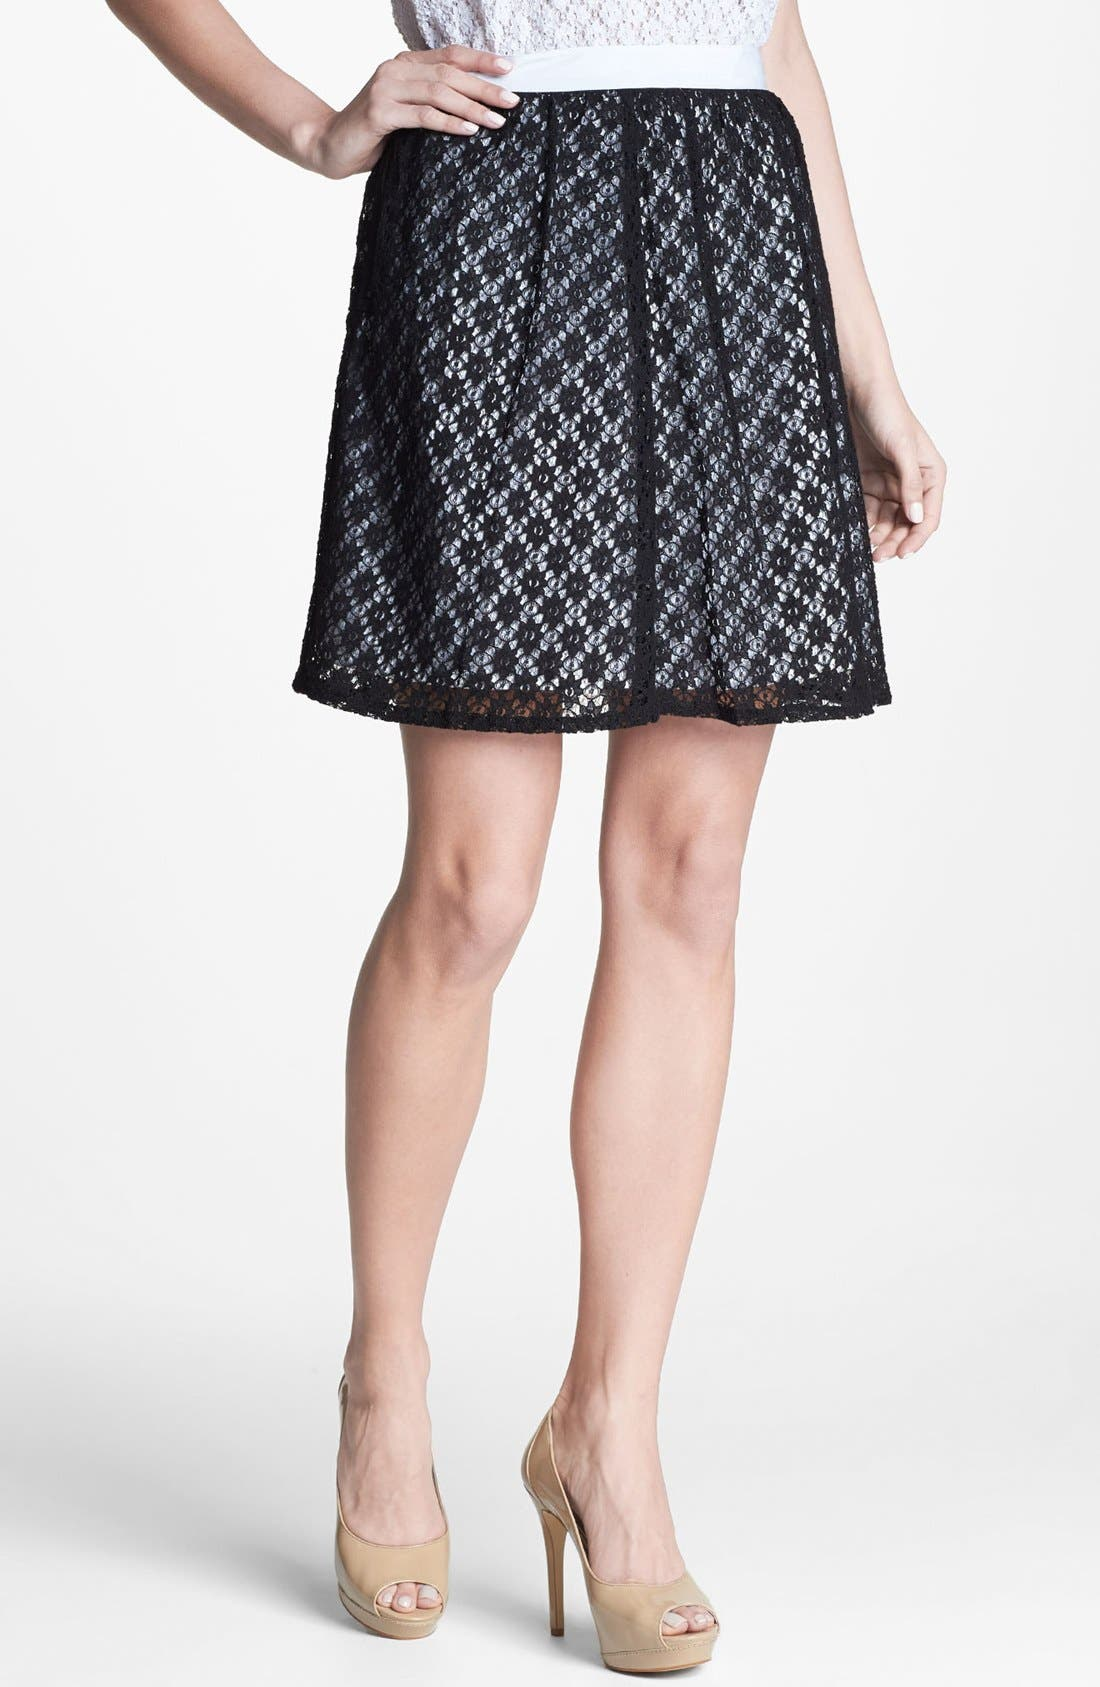 Alternate Image 1 Selected - Kensie Floral Lace Skirt